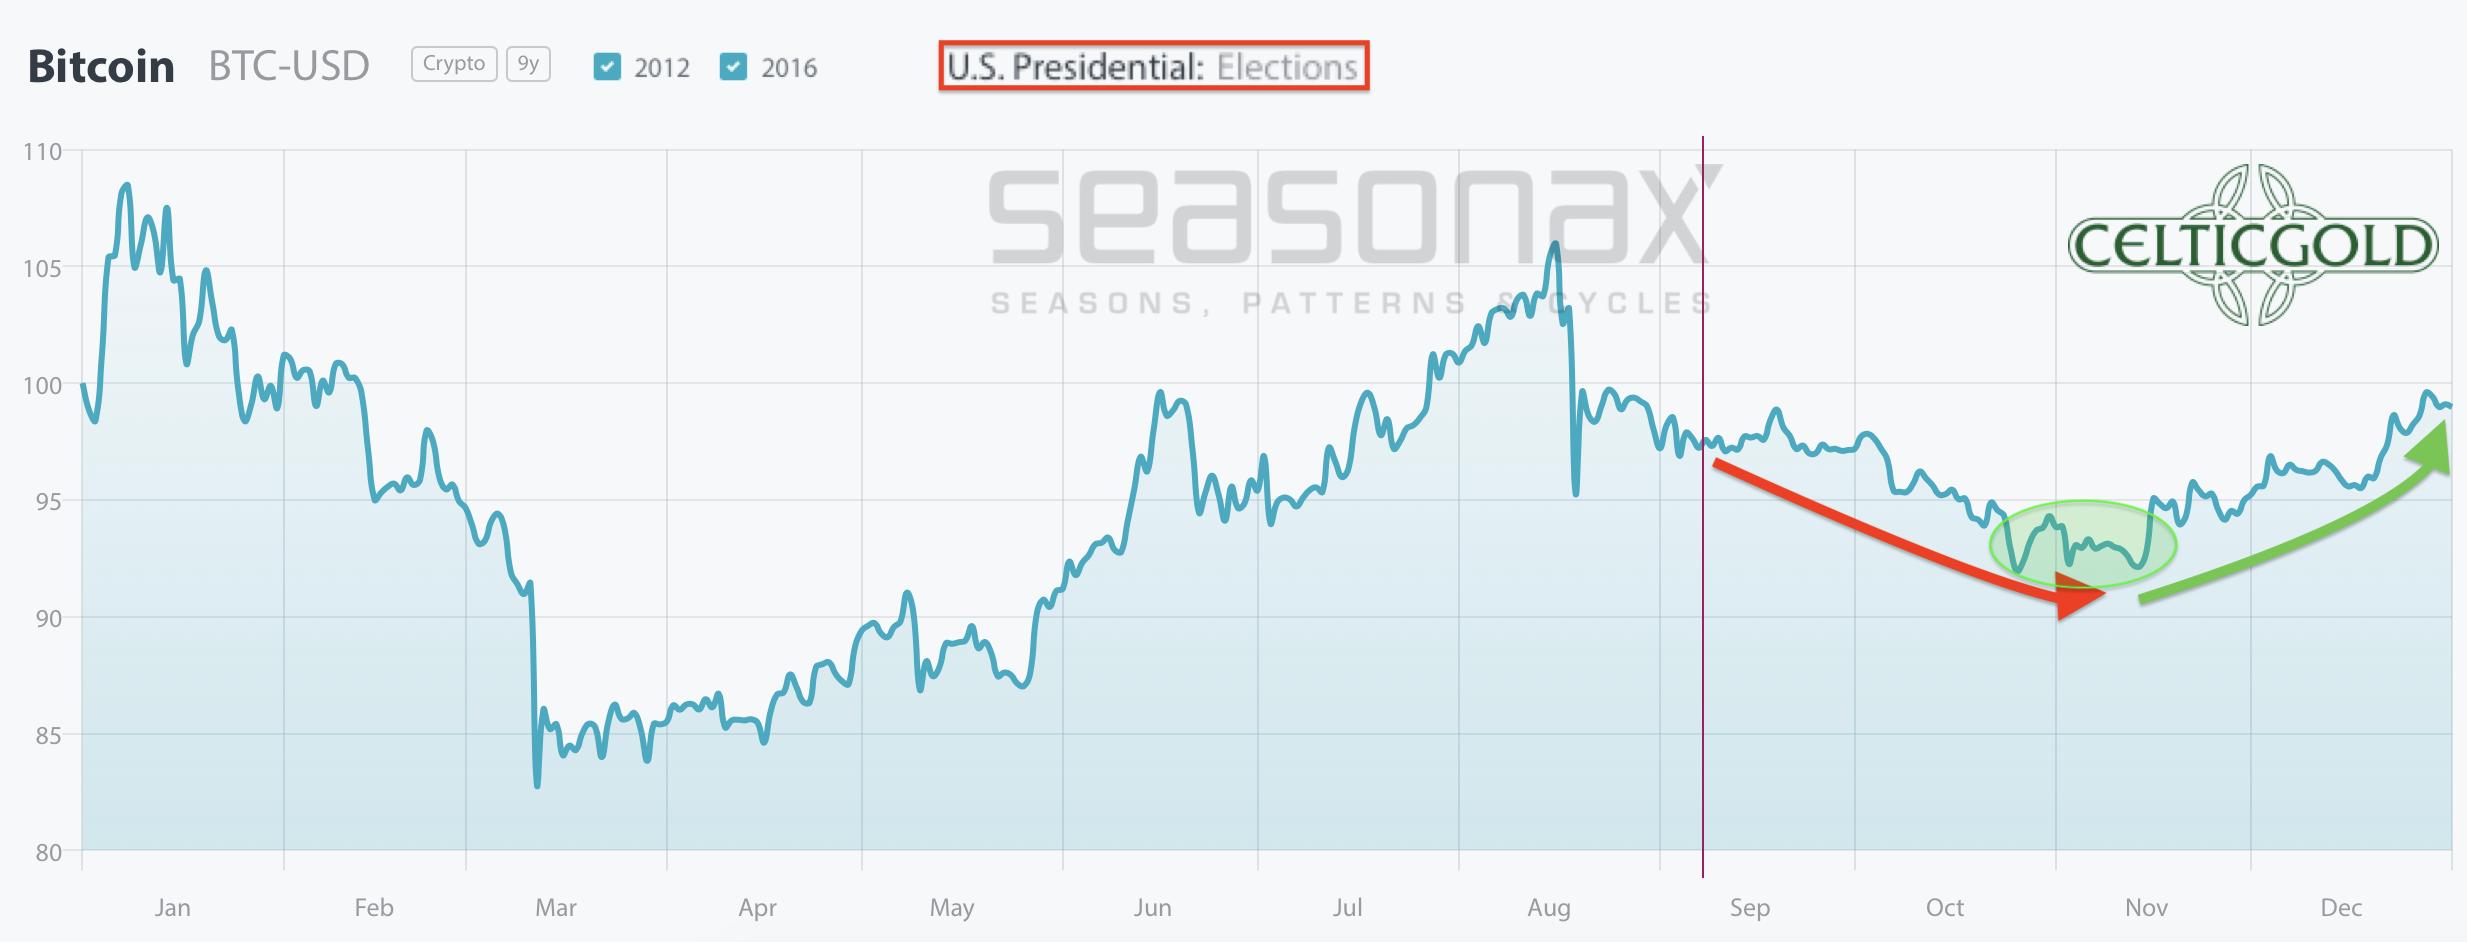 Bitcoin seasonality in US election years. Source:Seasonax